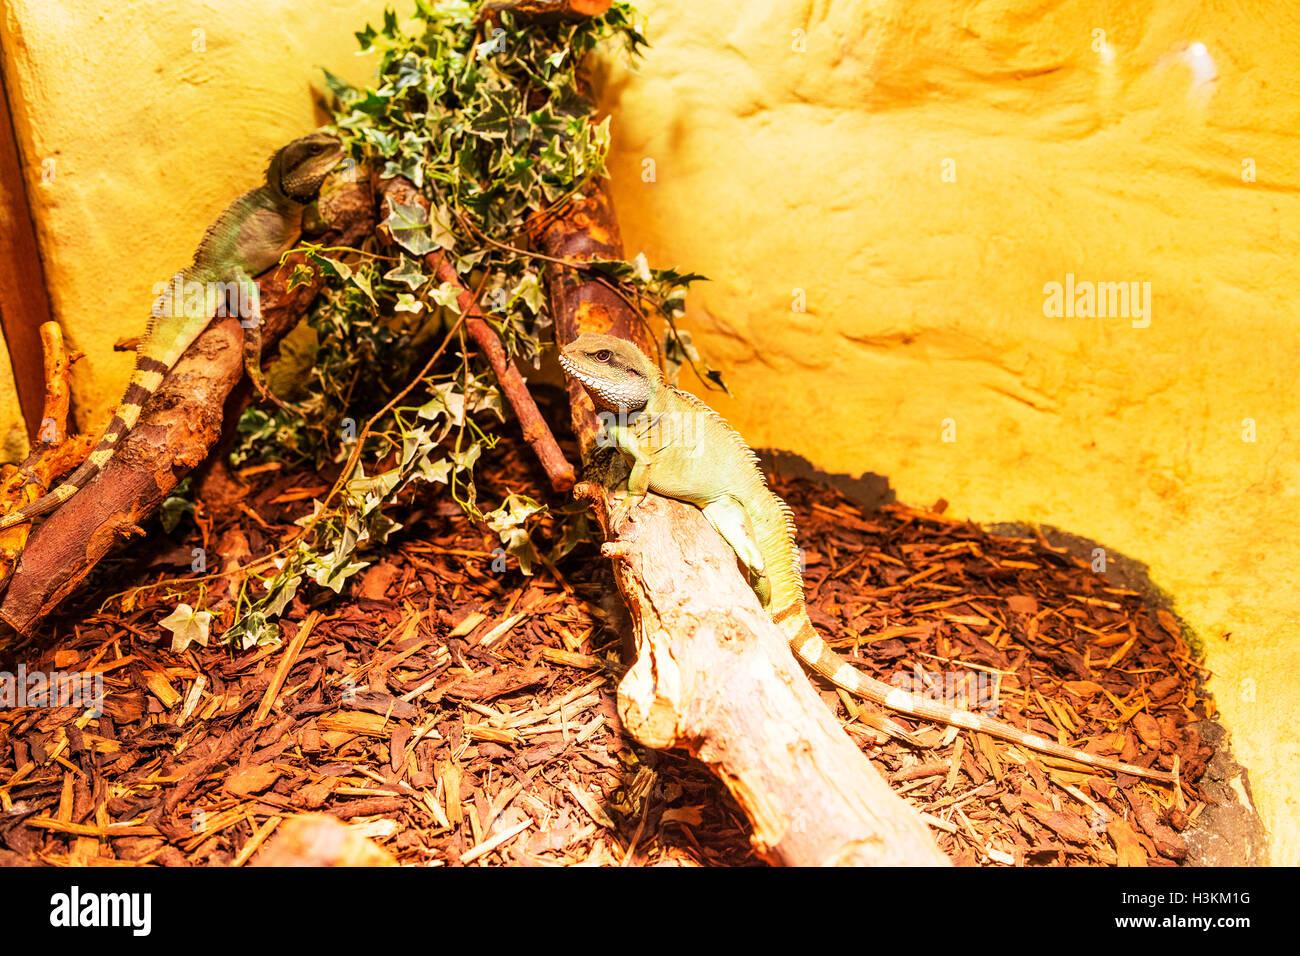 Lézard dragon d'eau Physignathus cocincinus lézards aquatiques dragons de l'eau semi en captivité Banque D'Images